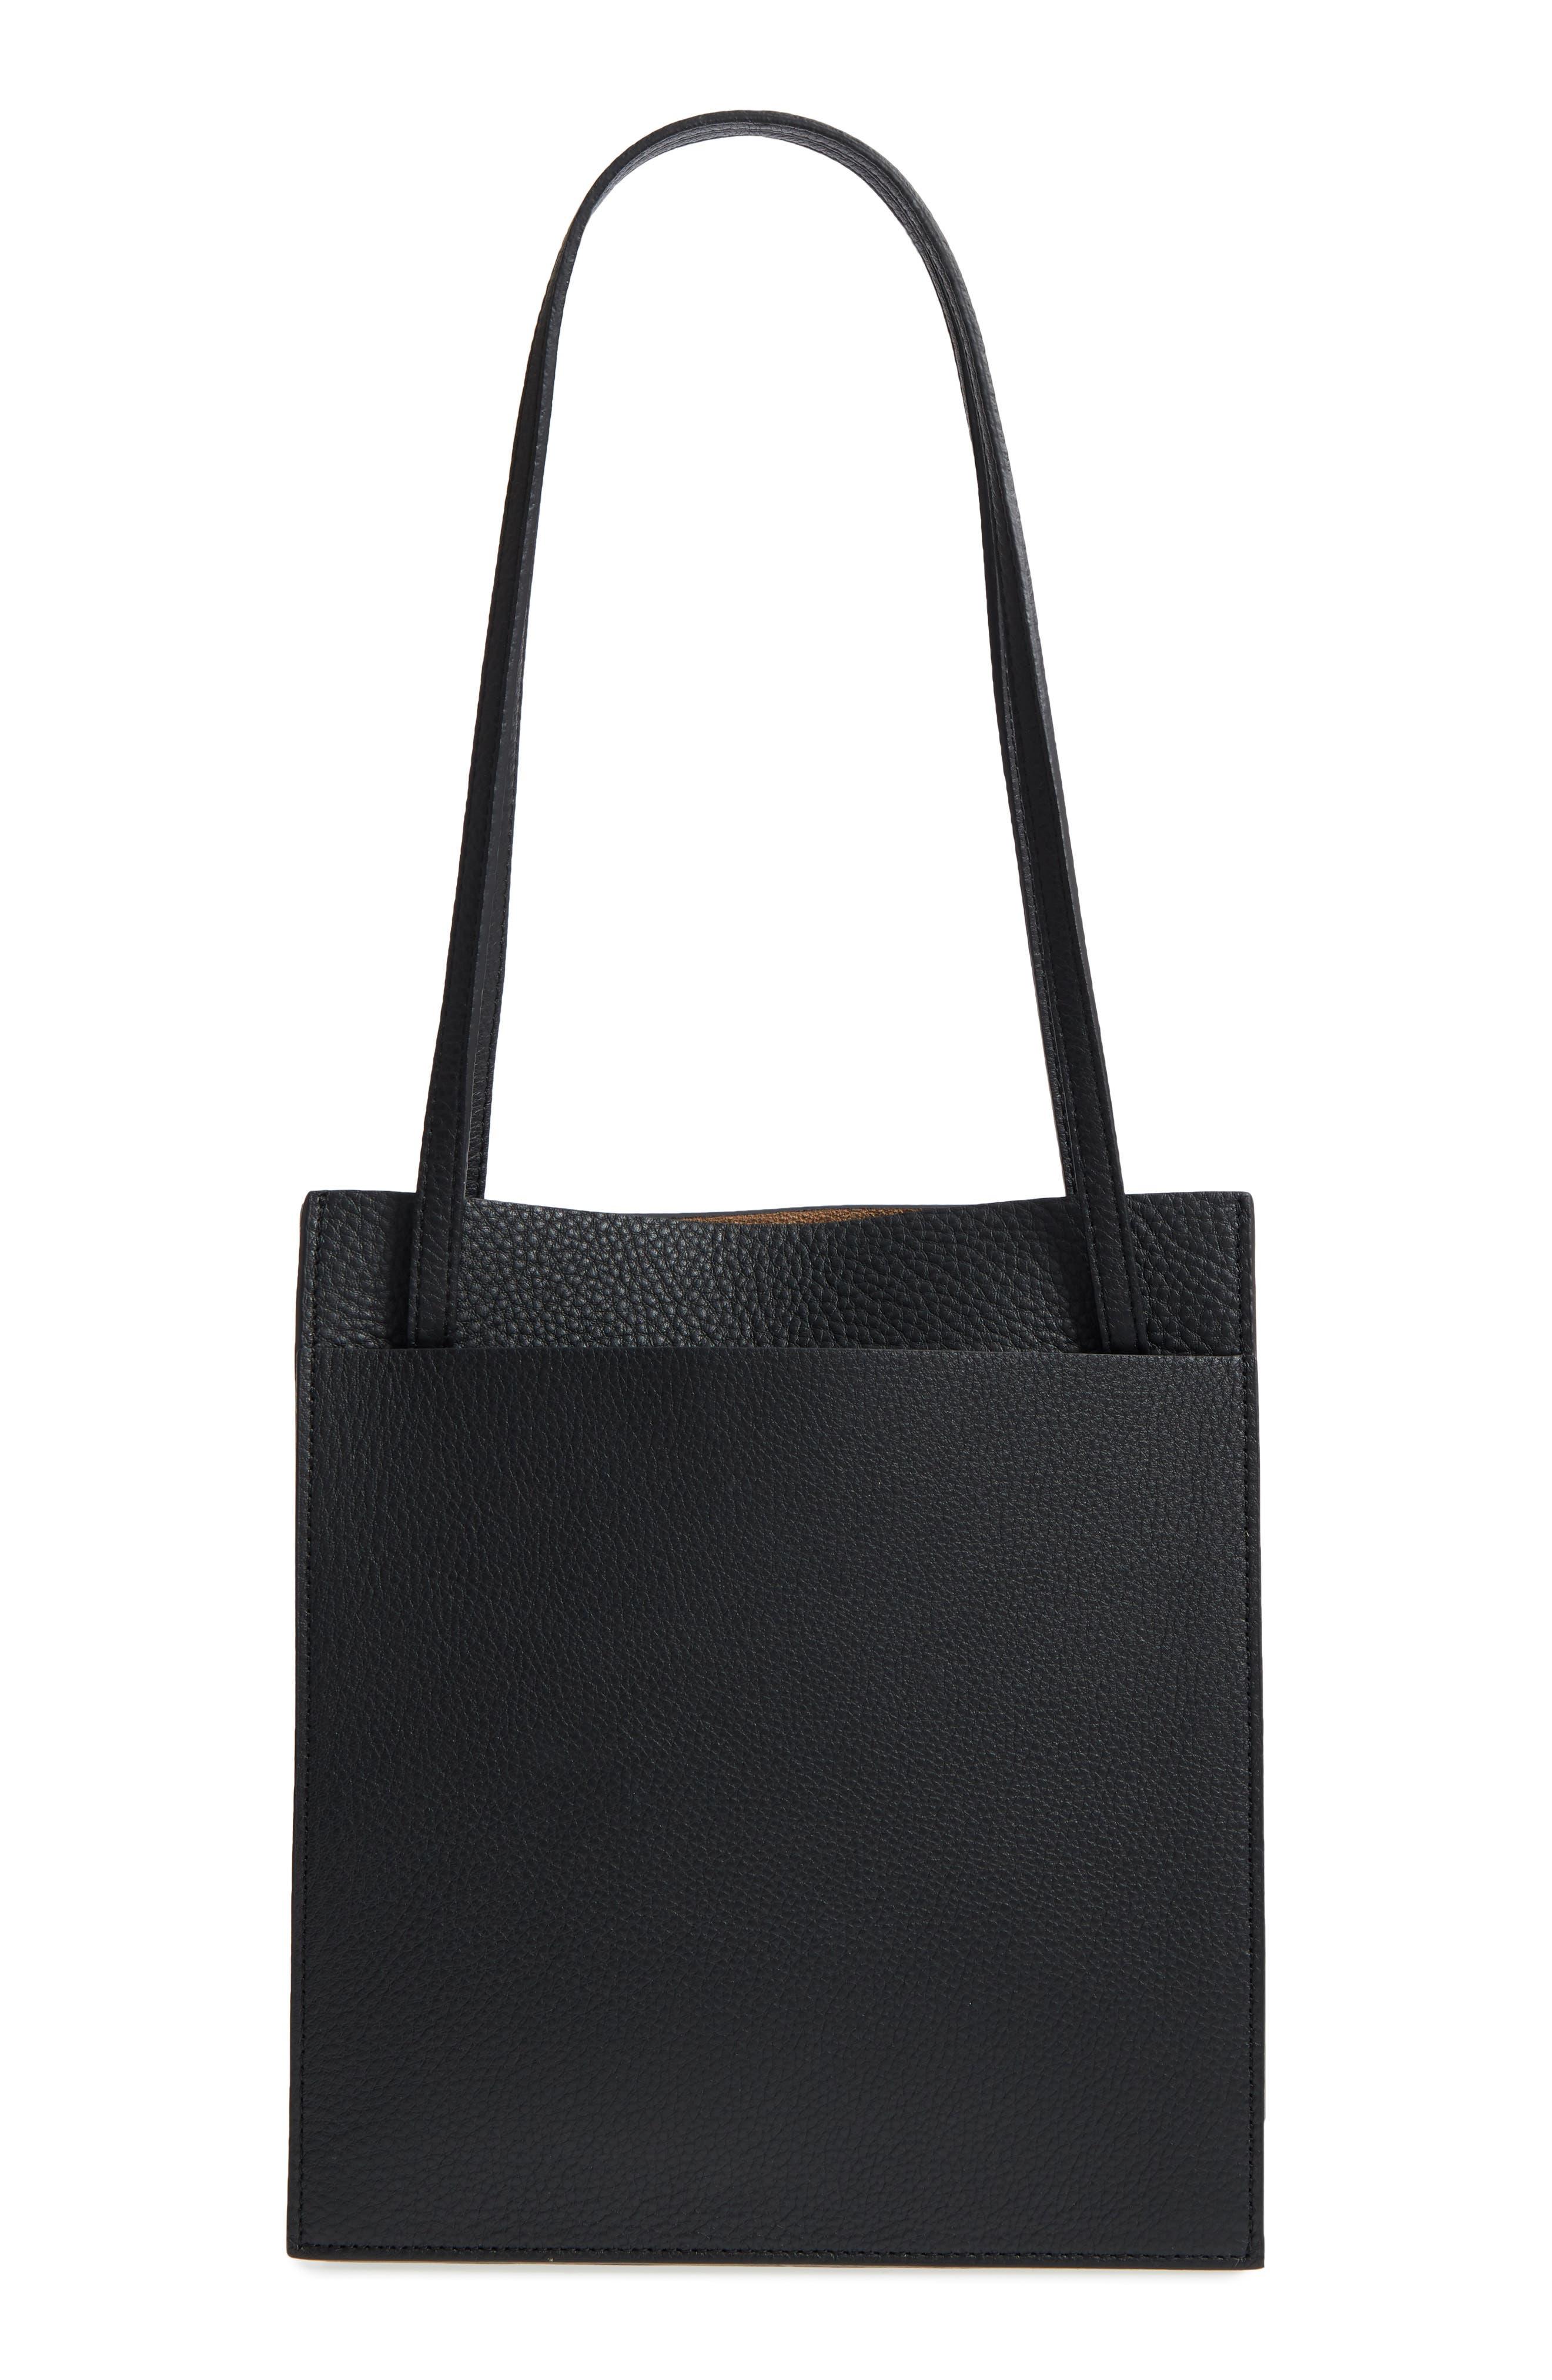 Kit Leather Convertible Shoulder Bag,                             Alternate thumbnail 4, color,                             TRUE BLACK